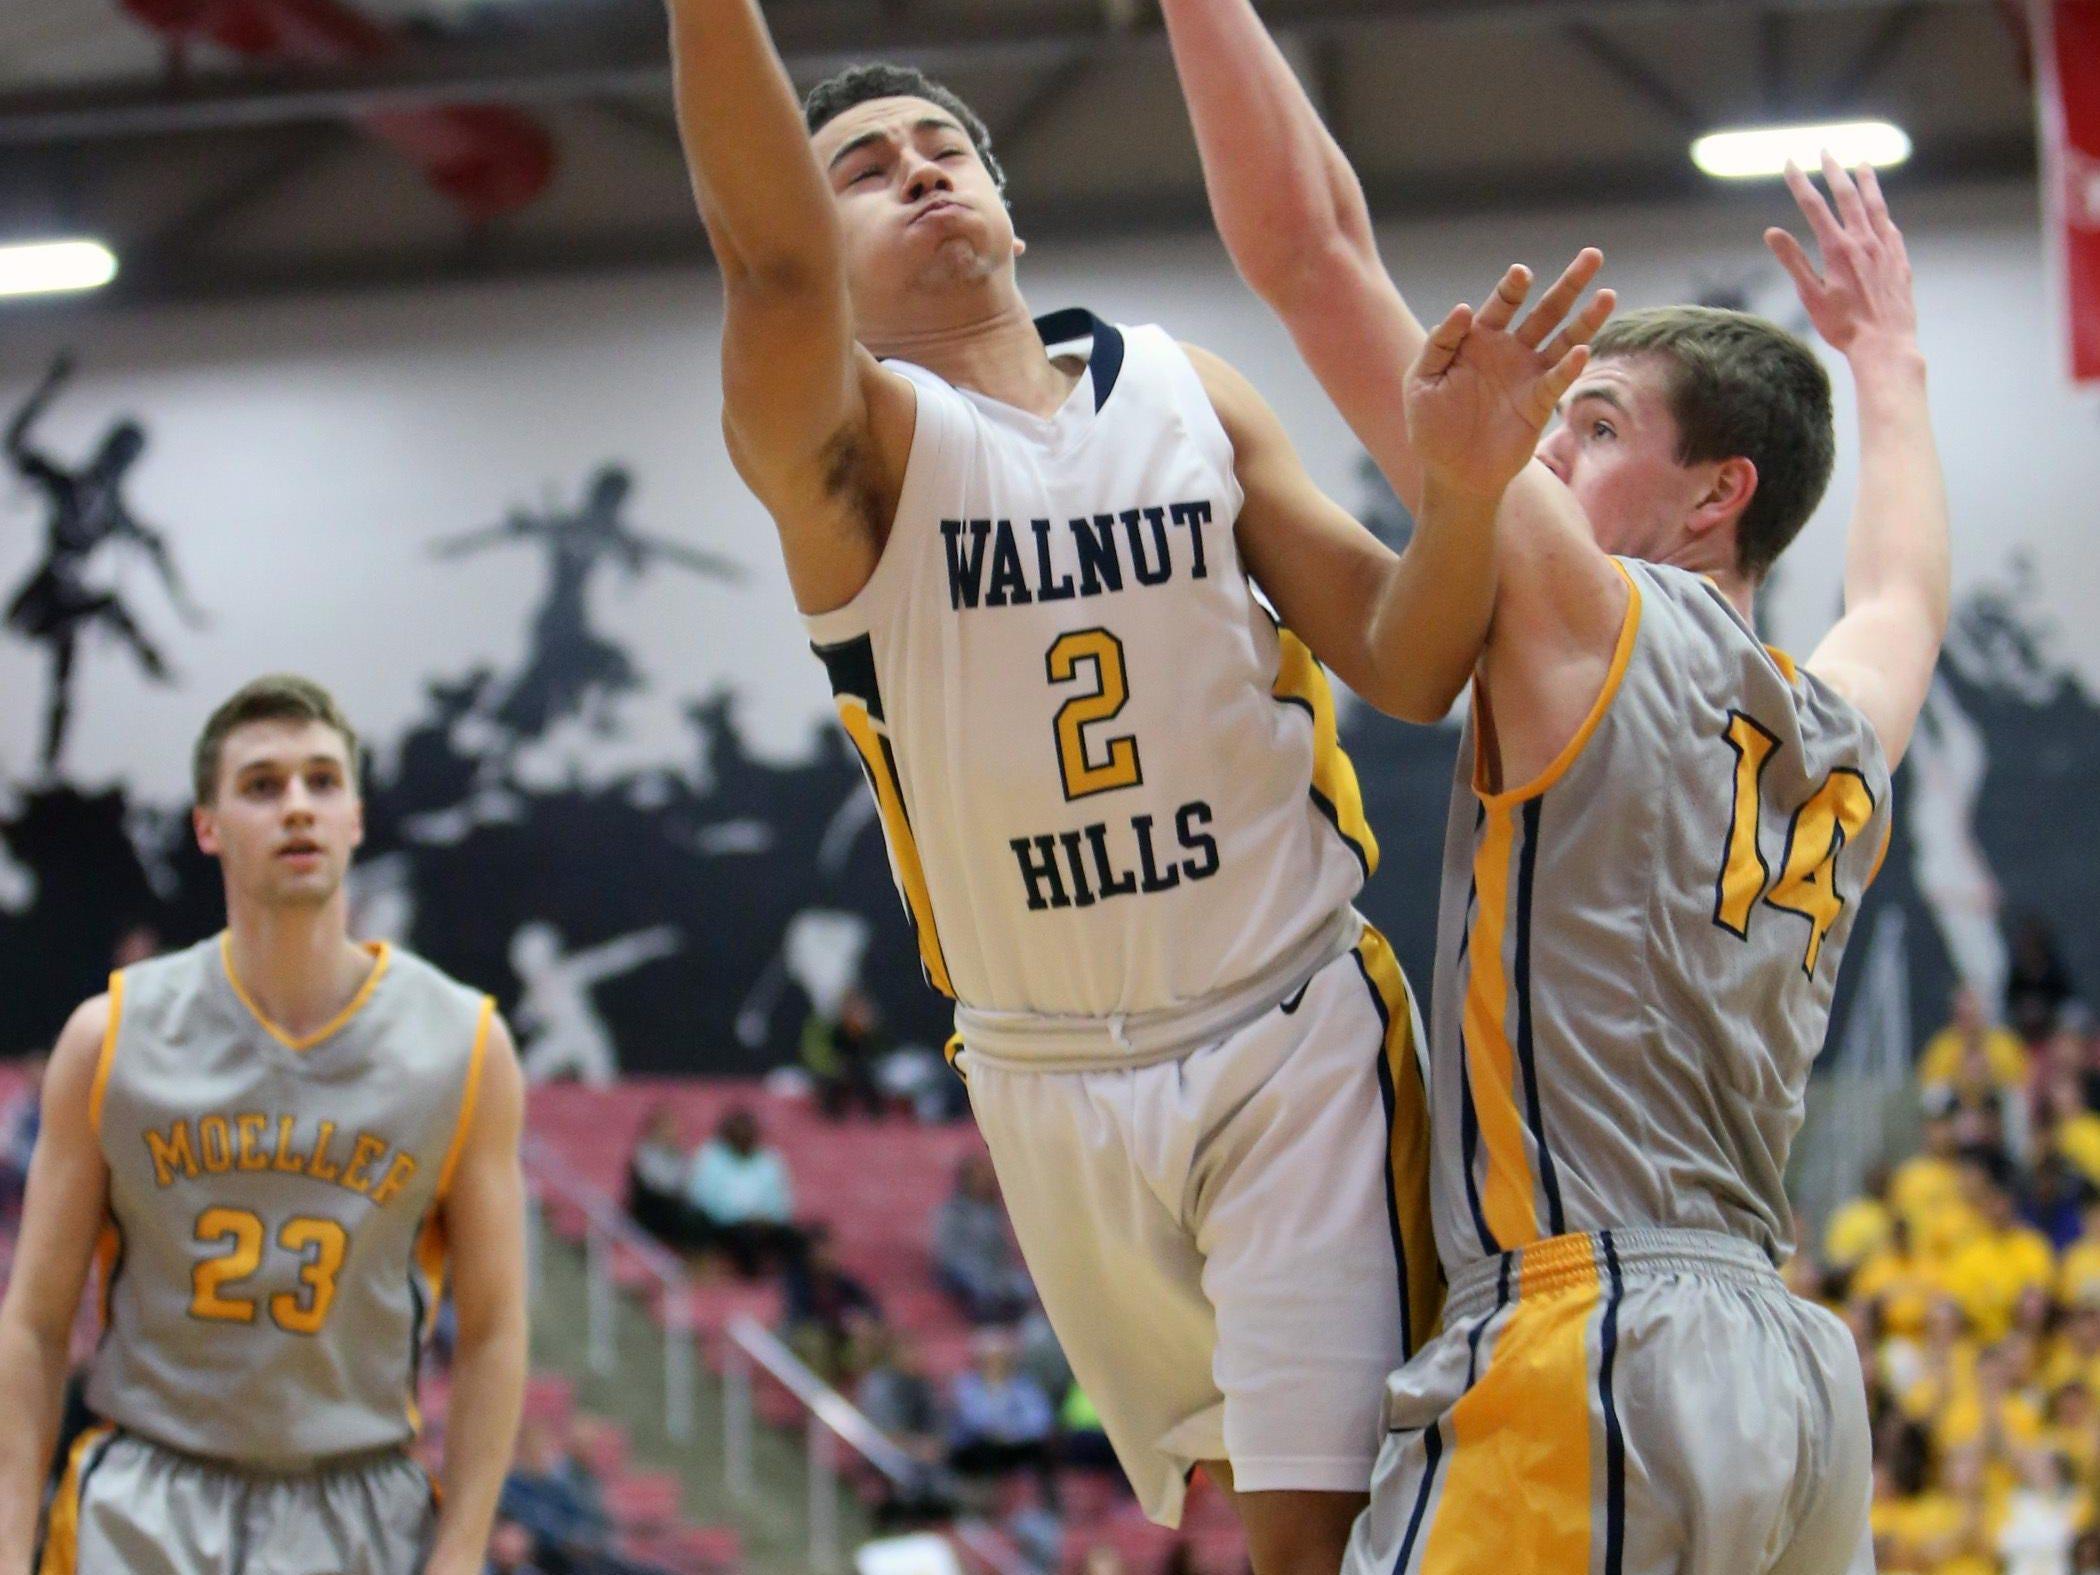 Walnut Hills forward Michael Davenport (2) attacks the basket in the sectional tournament last season.